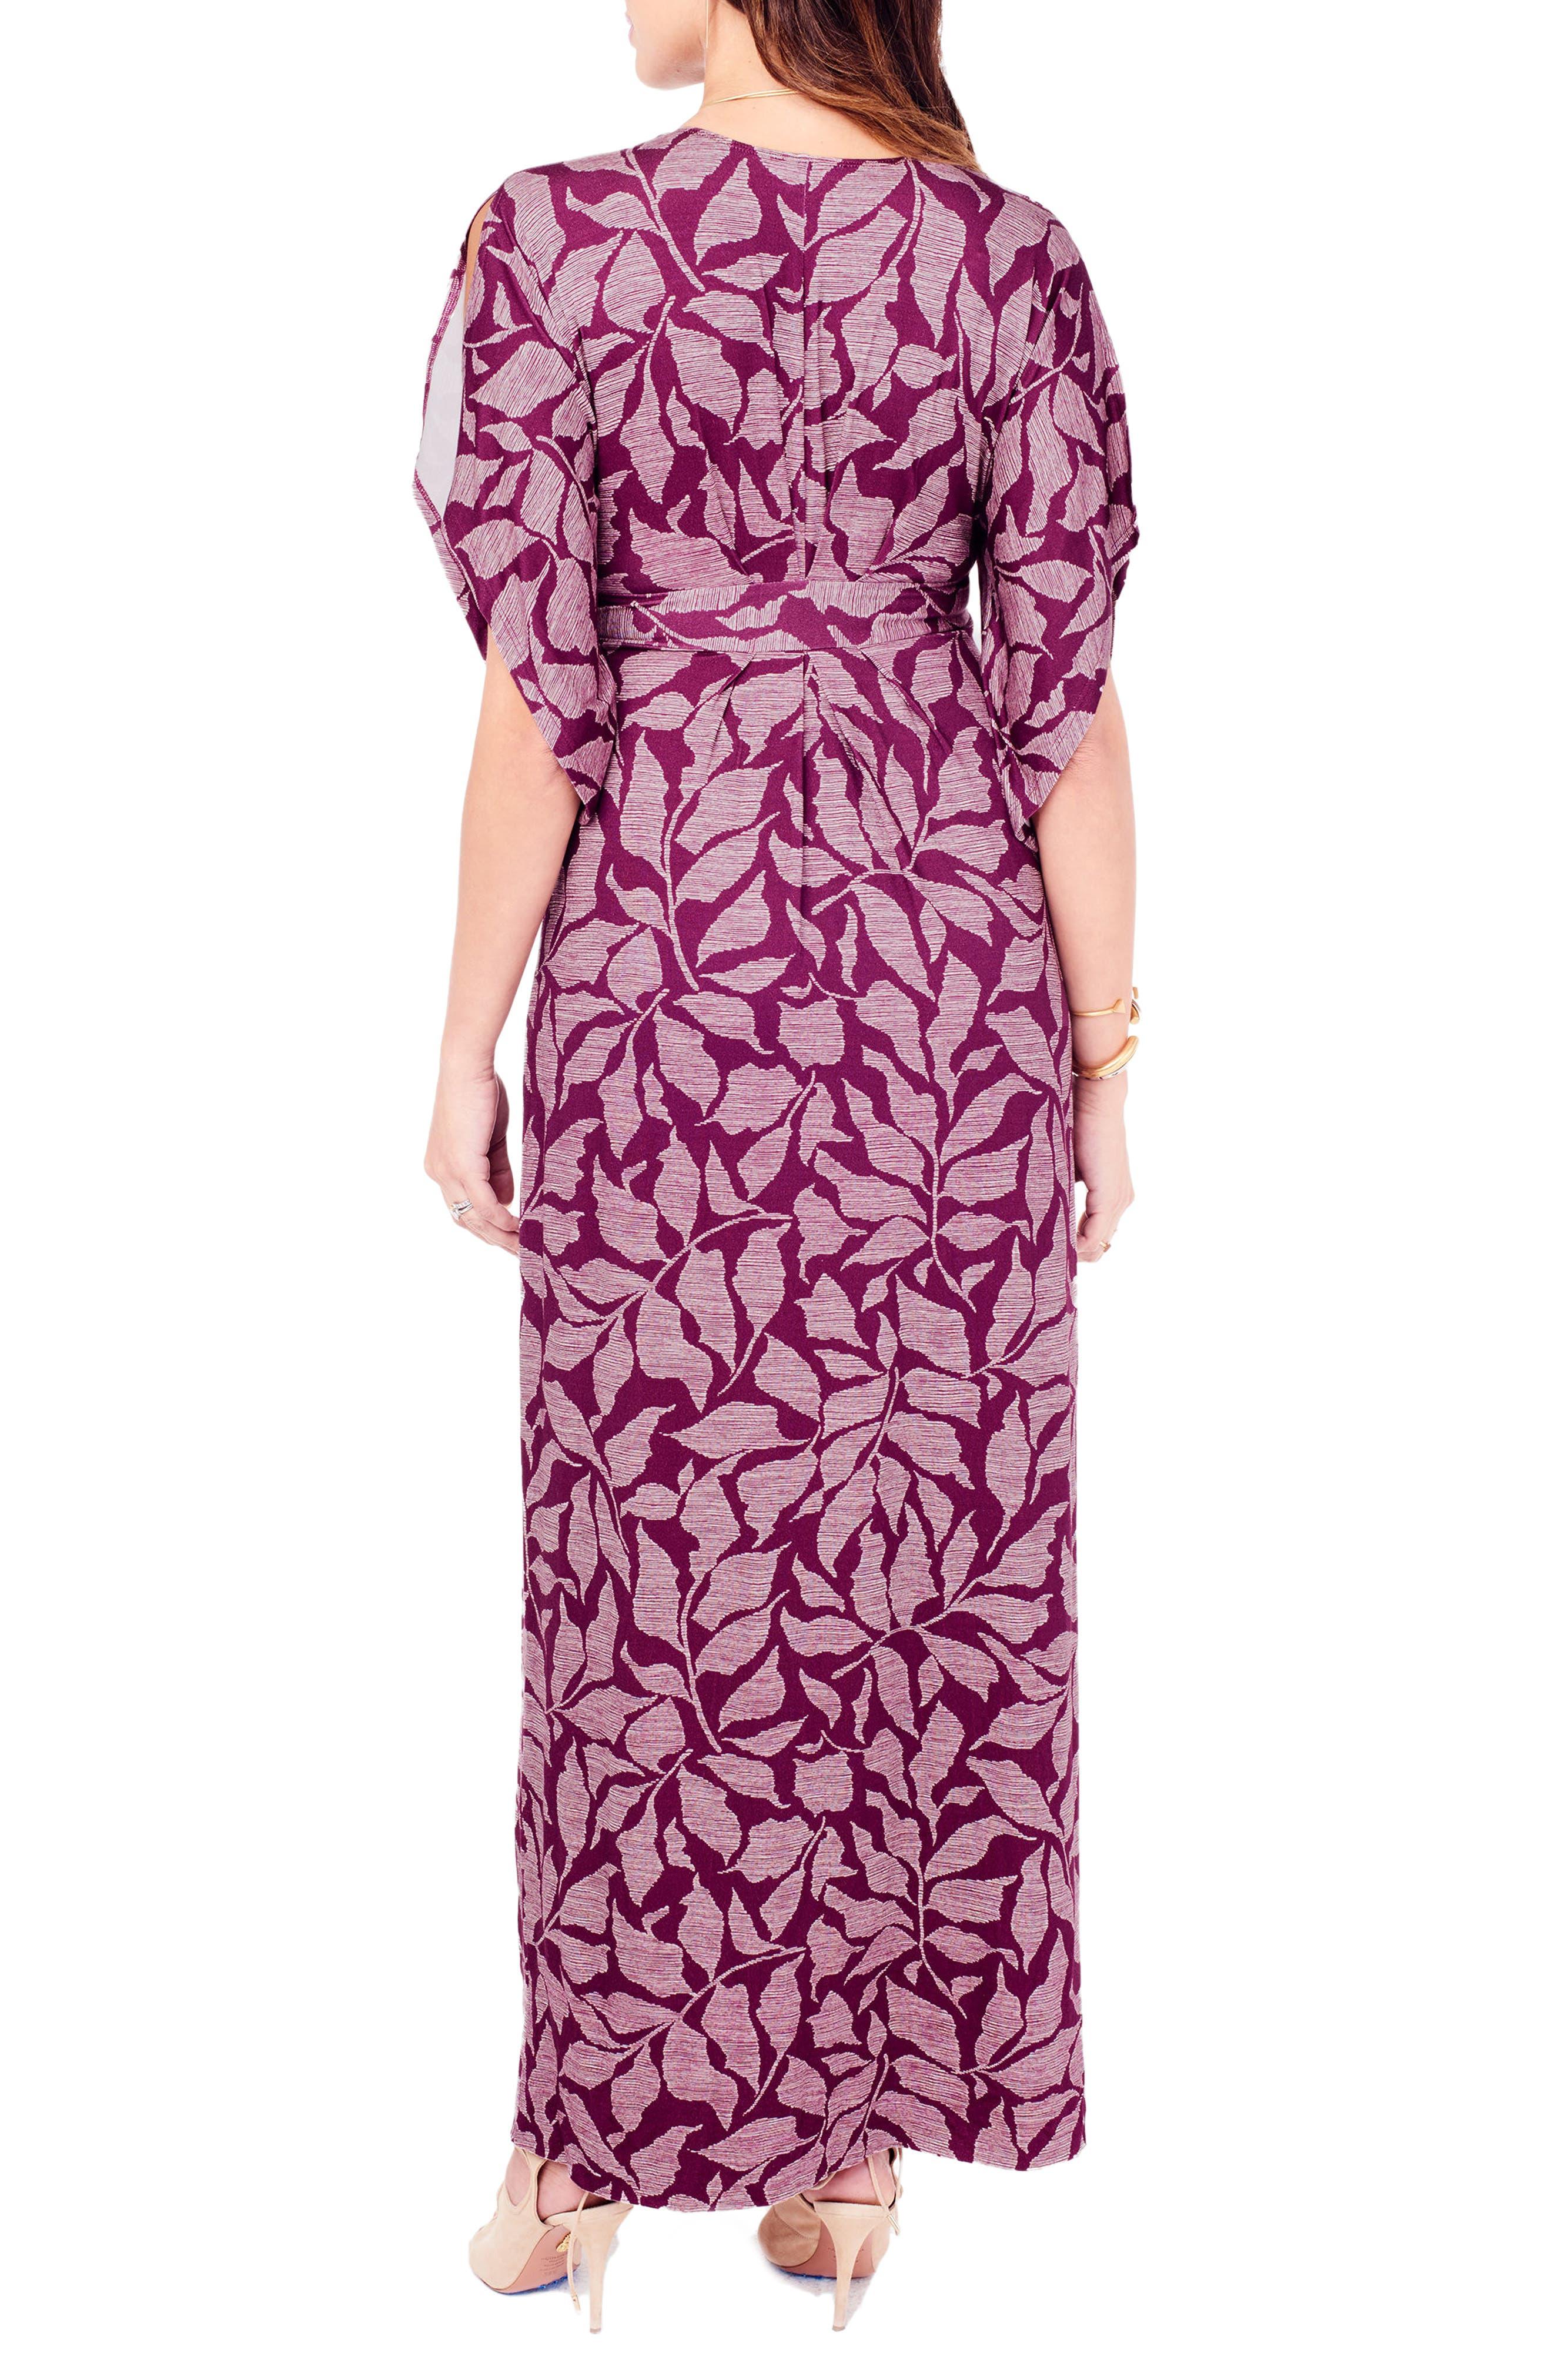 Ingrid & Isabel Split Kimono Sleeve Maternity Maxi Dress,                             Alternate thumbnail 3, color,                             Plum Leaf Print